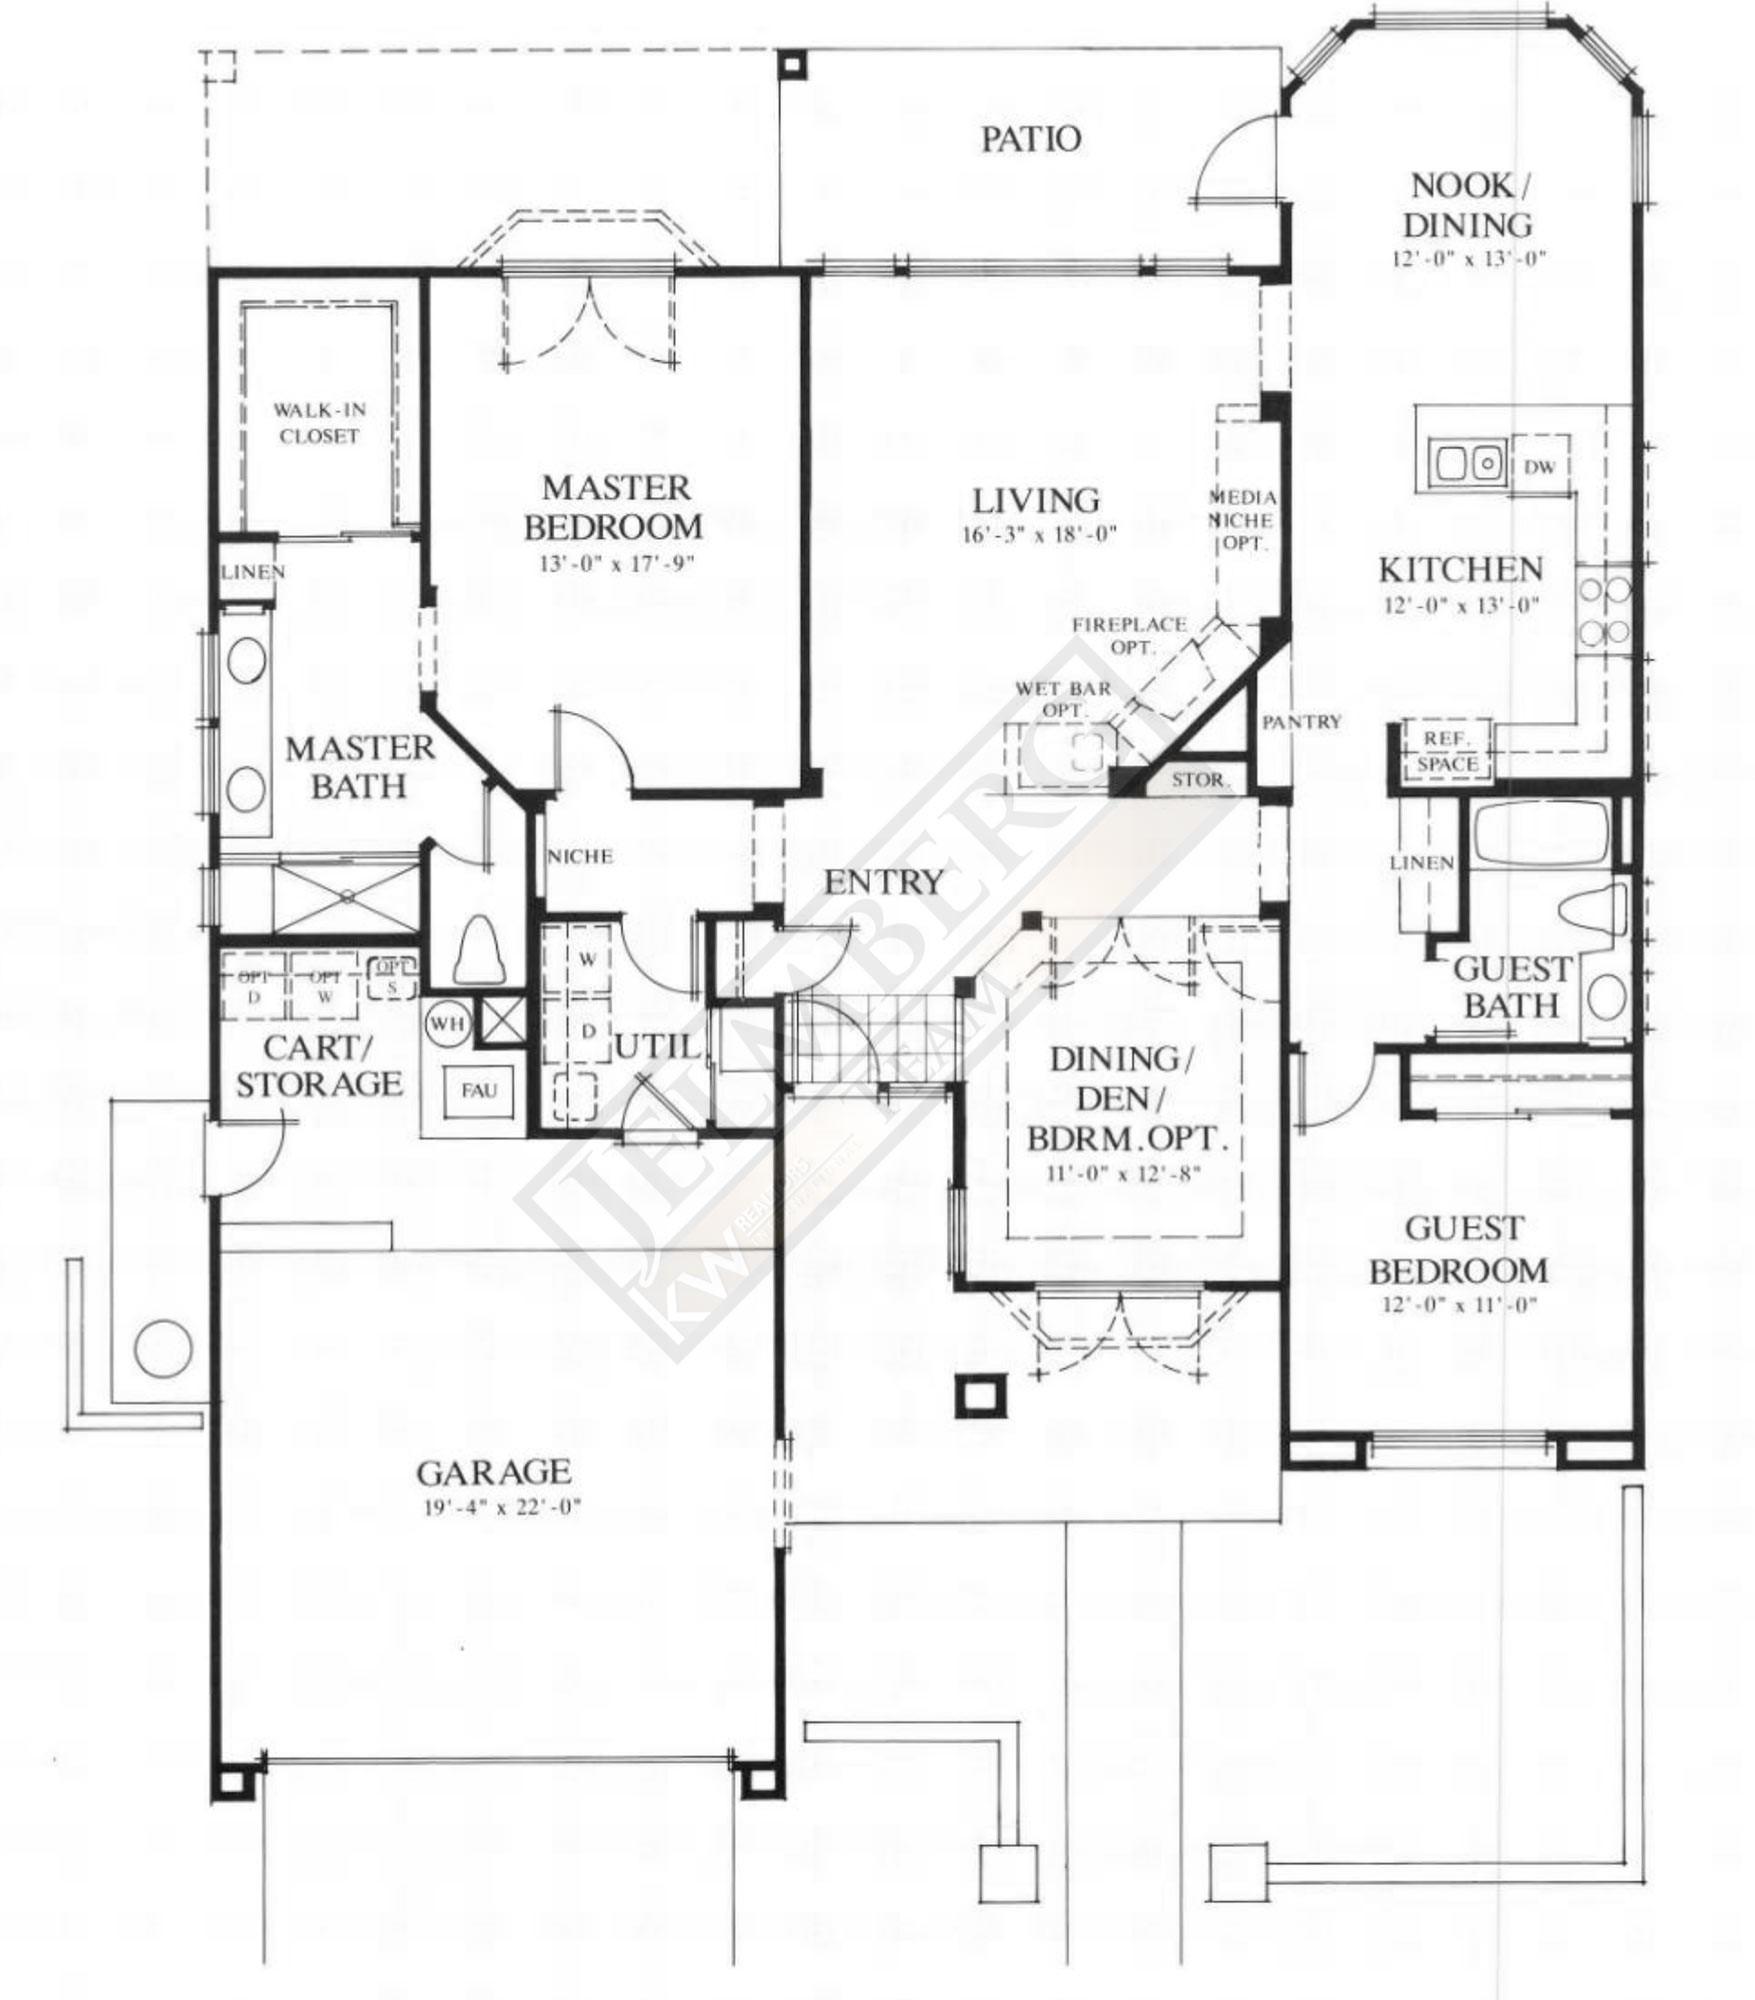 Lenox model floor plan coachella valley area real estate for The lenox floor plan